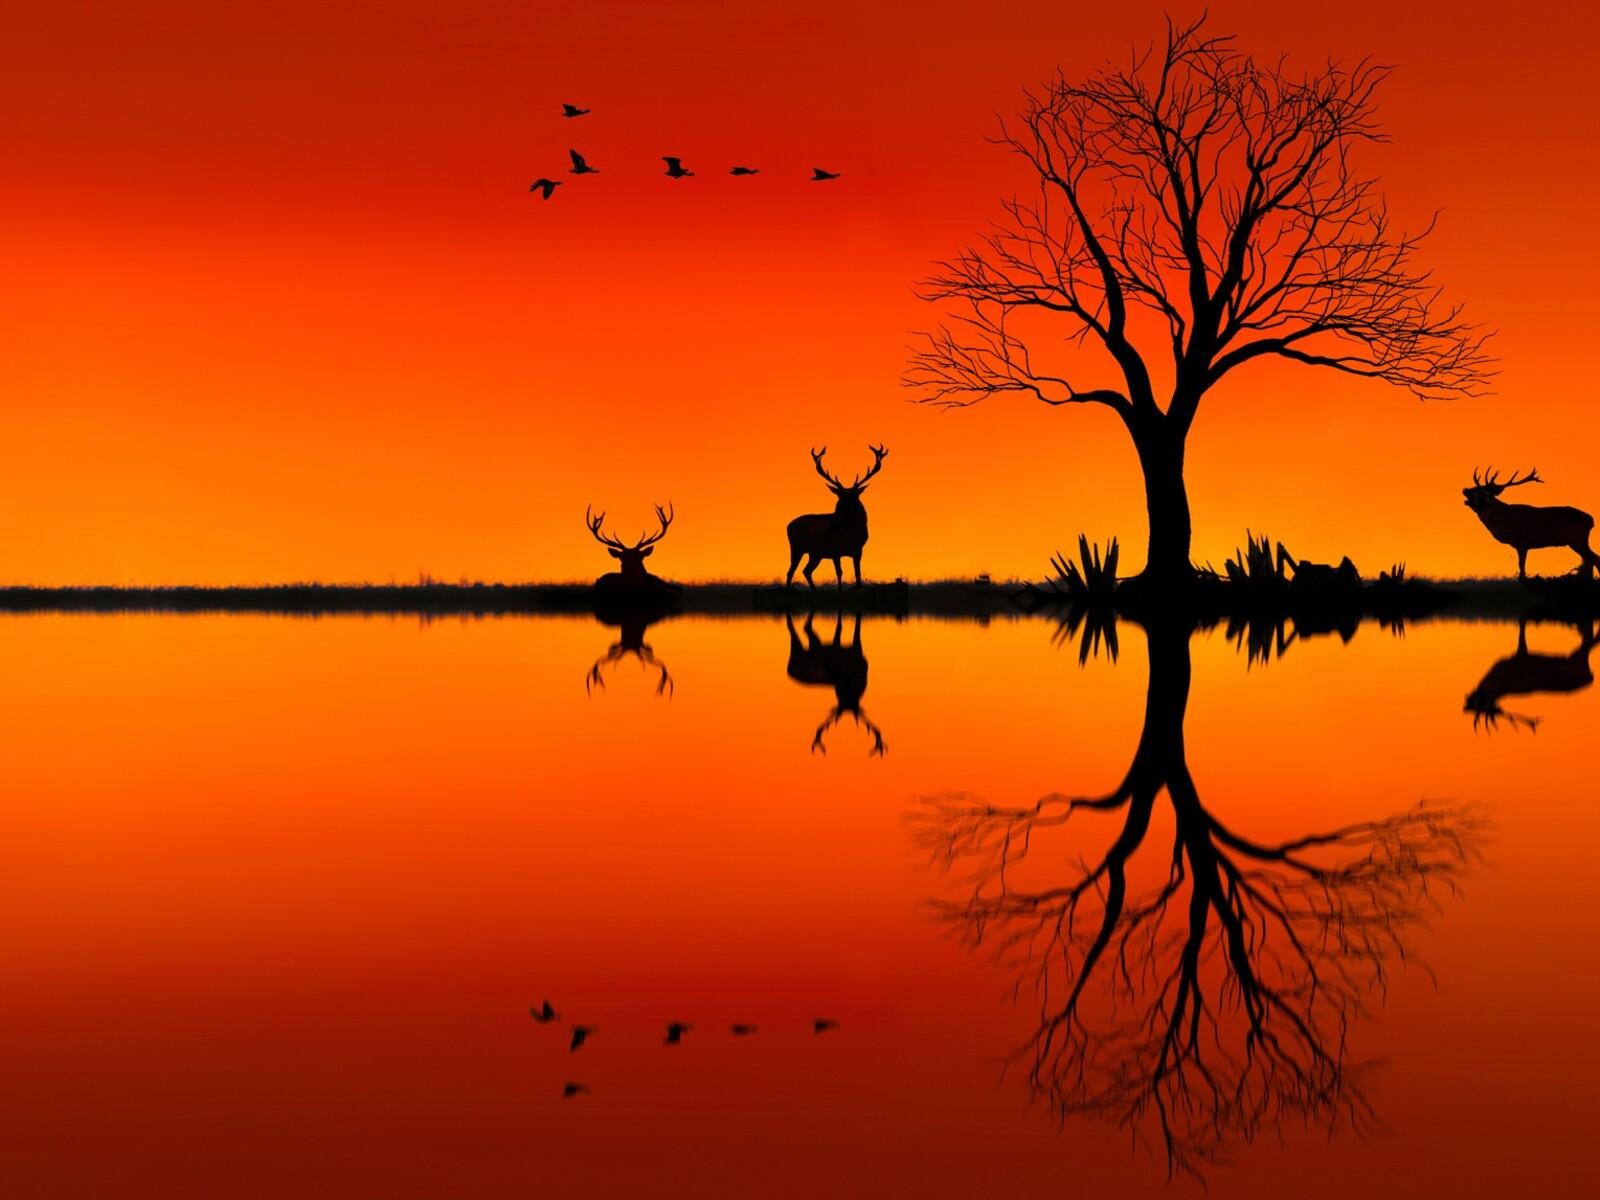 elk-on-horizon-sunset-evening-z6.jpg